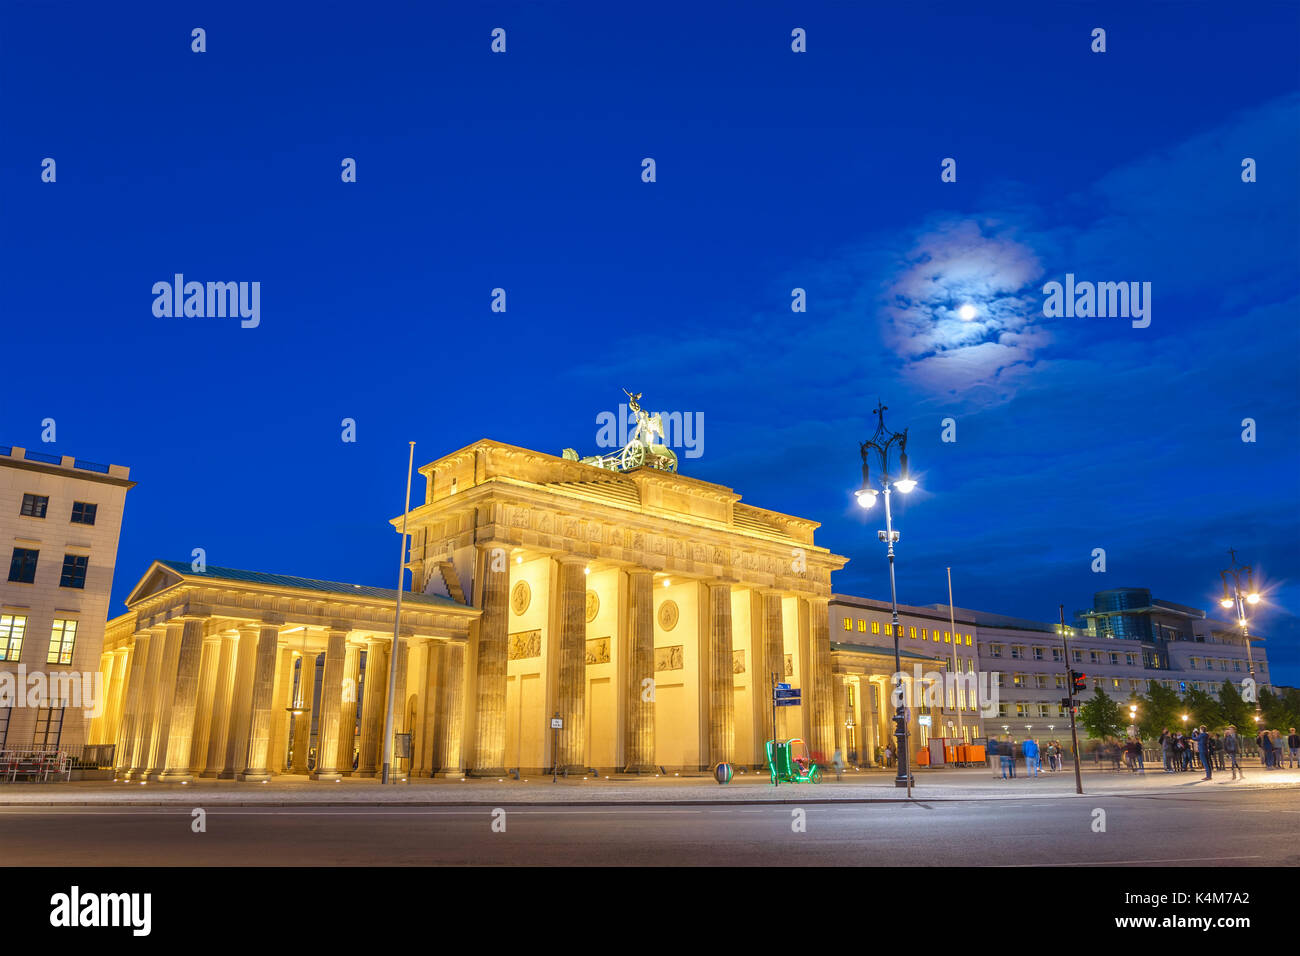 Berlin night skyline at Brandenburg Gate (Brandenburger Tor), Berlin, Germany - Stock Image